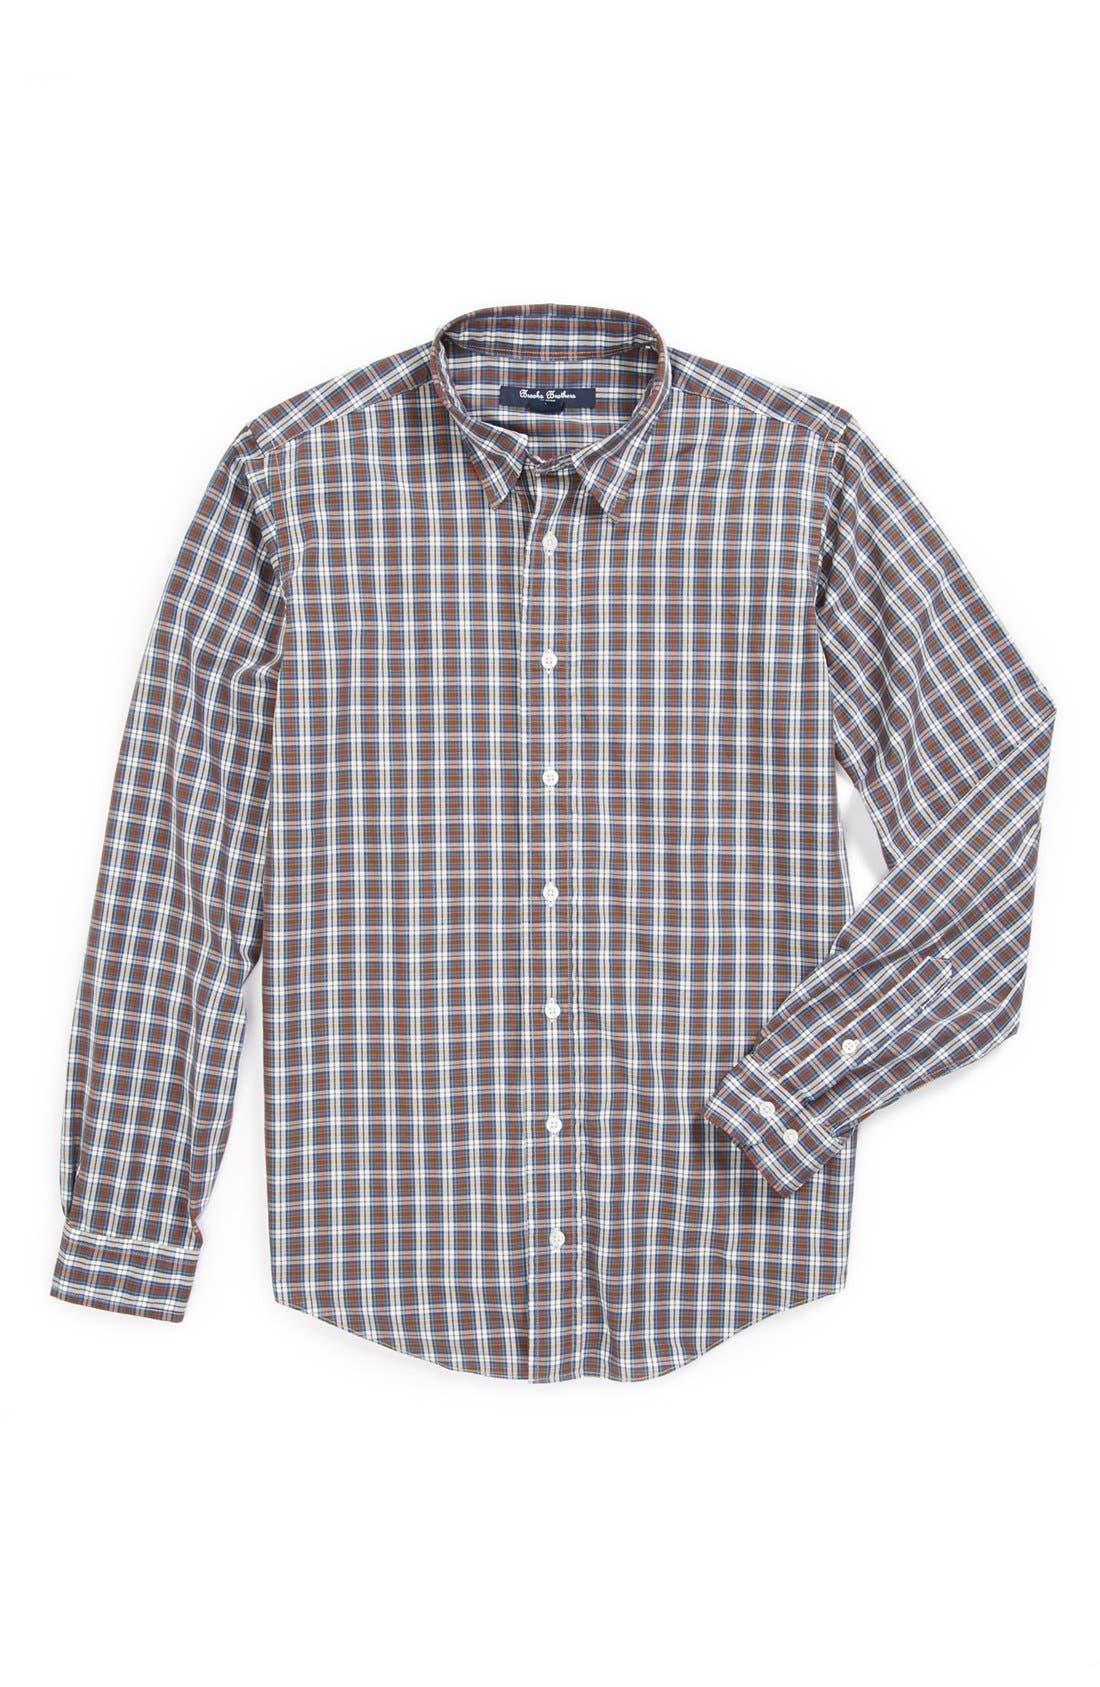 Main Image - Brooks Brothers Plaid Dress Shirt (Big Boys)